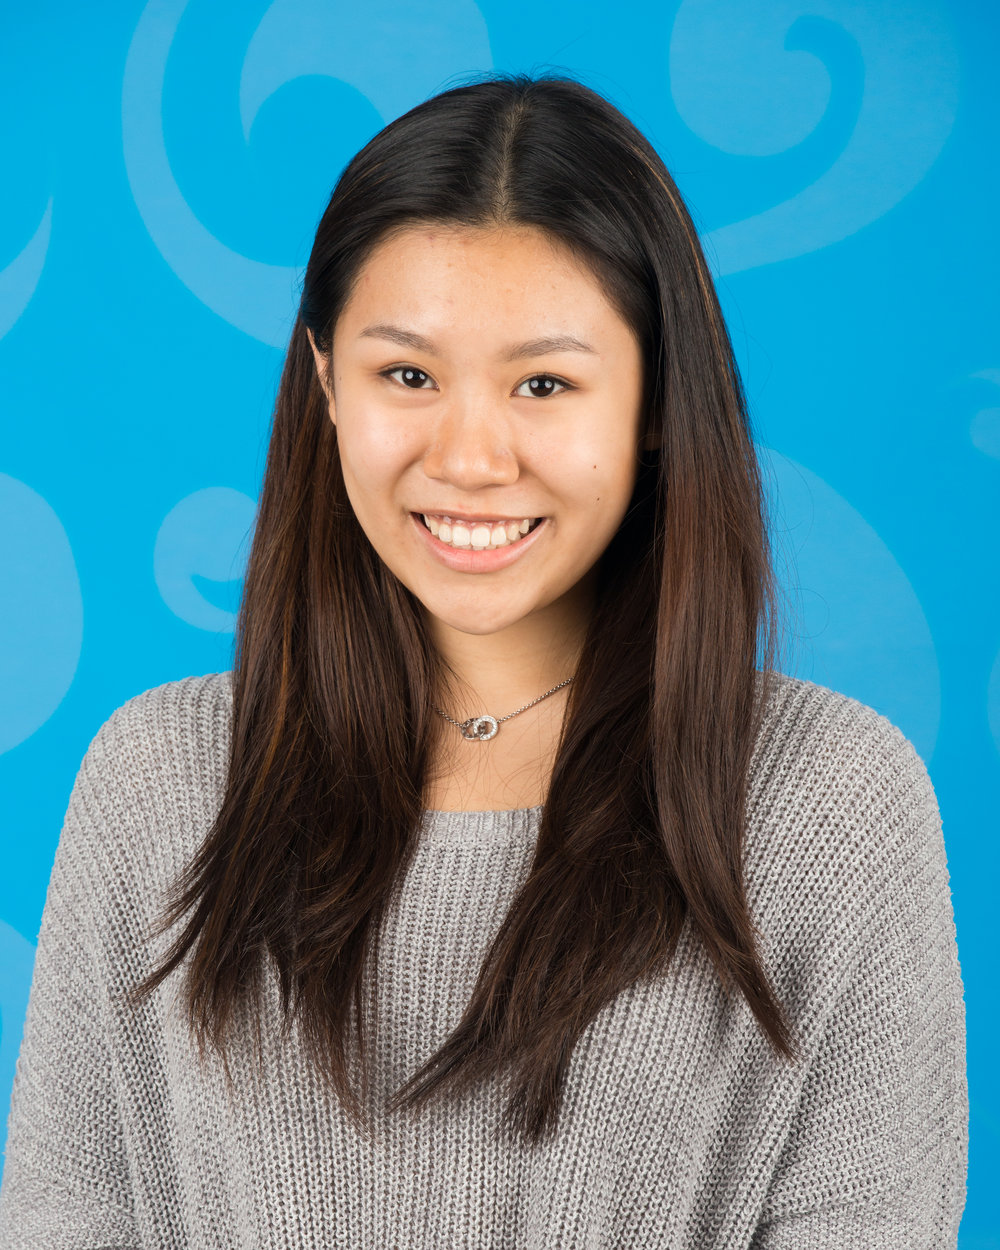 Emily Yuan, Western Academy of Beijing, Grade 11